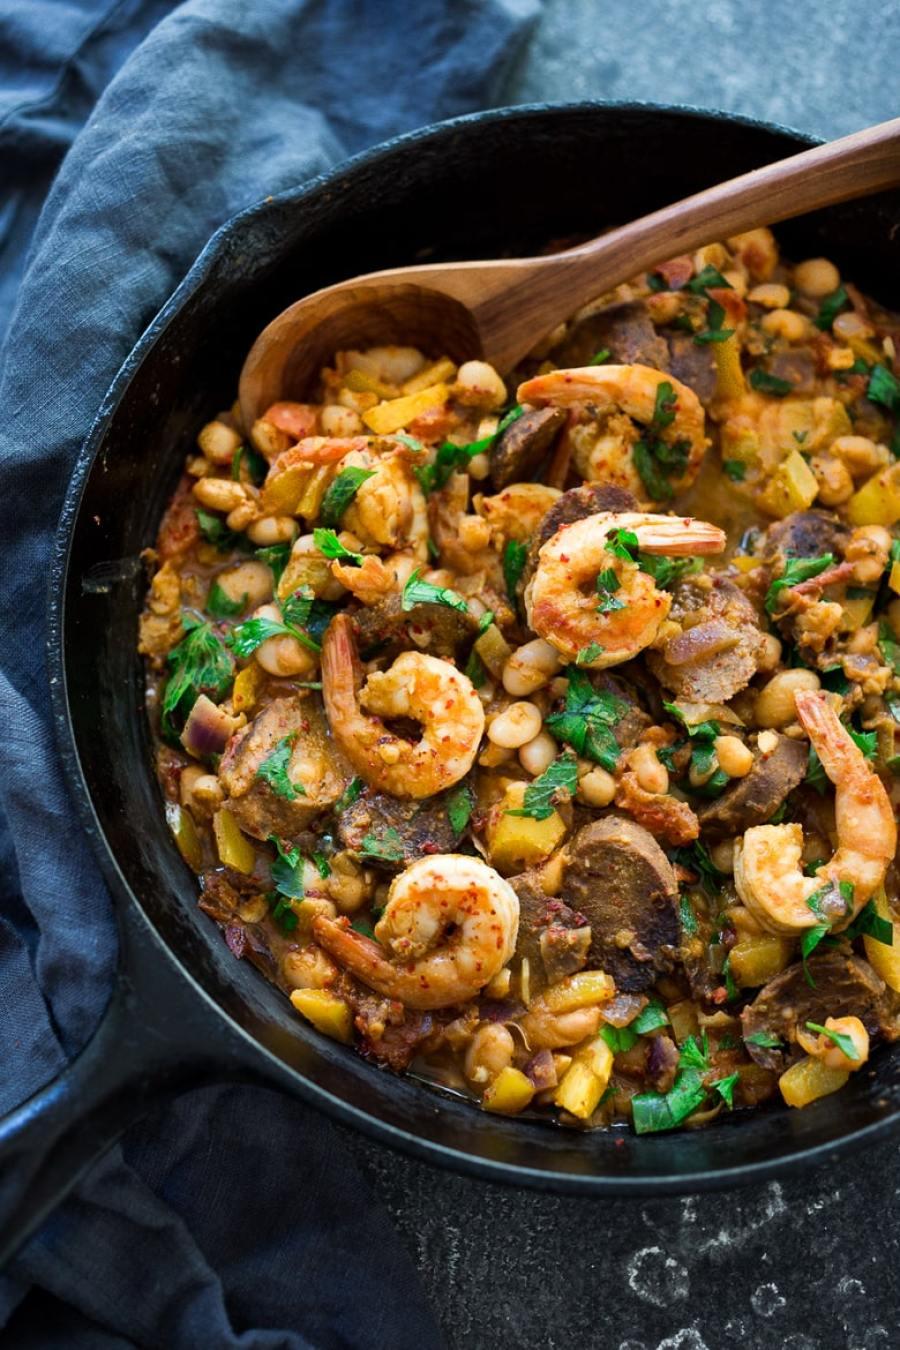 Spanish White bean, Shrimp and Sausage Skillet